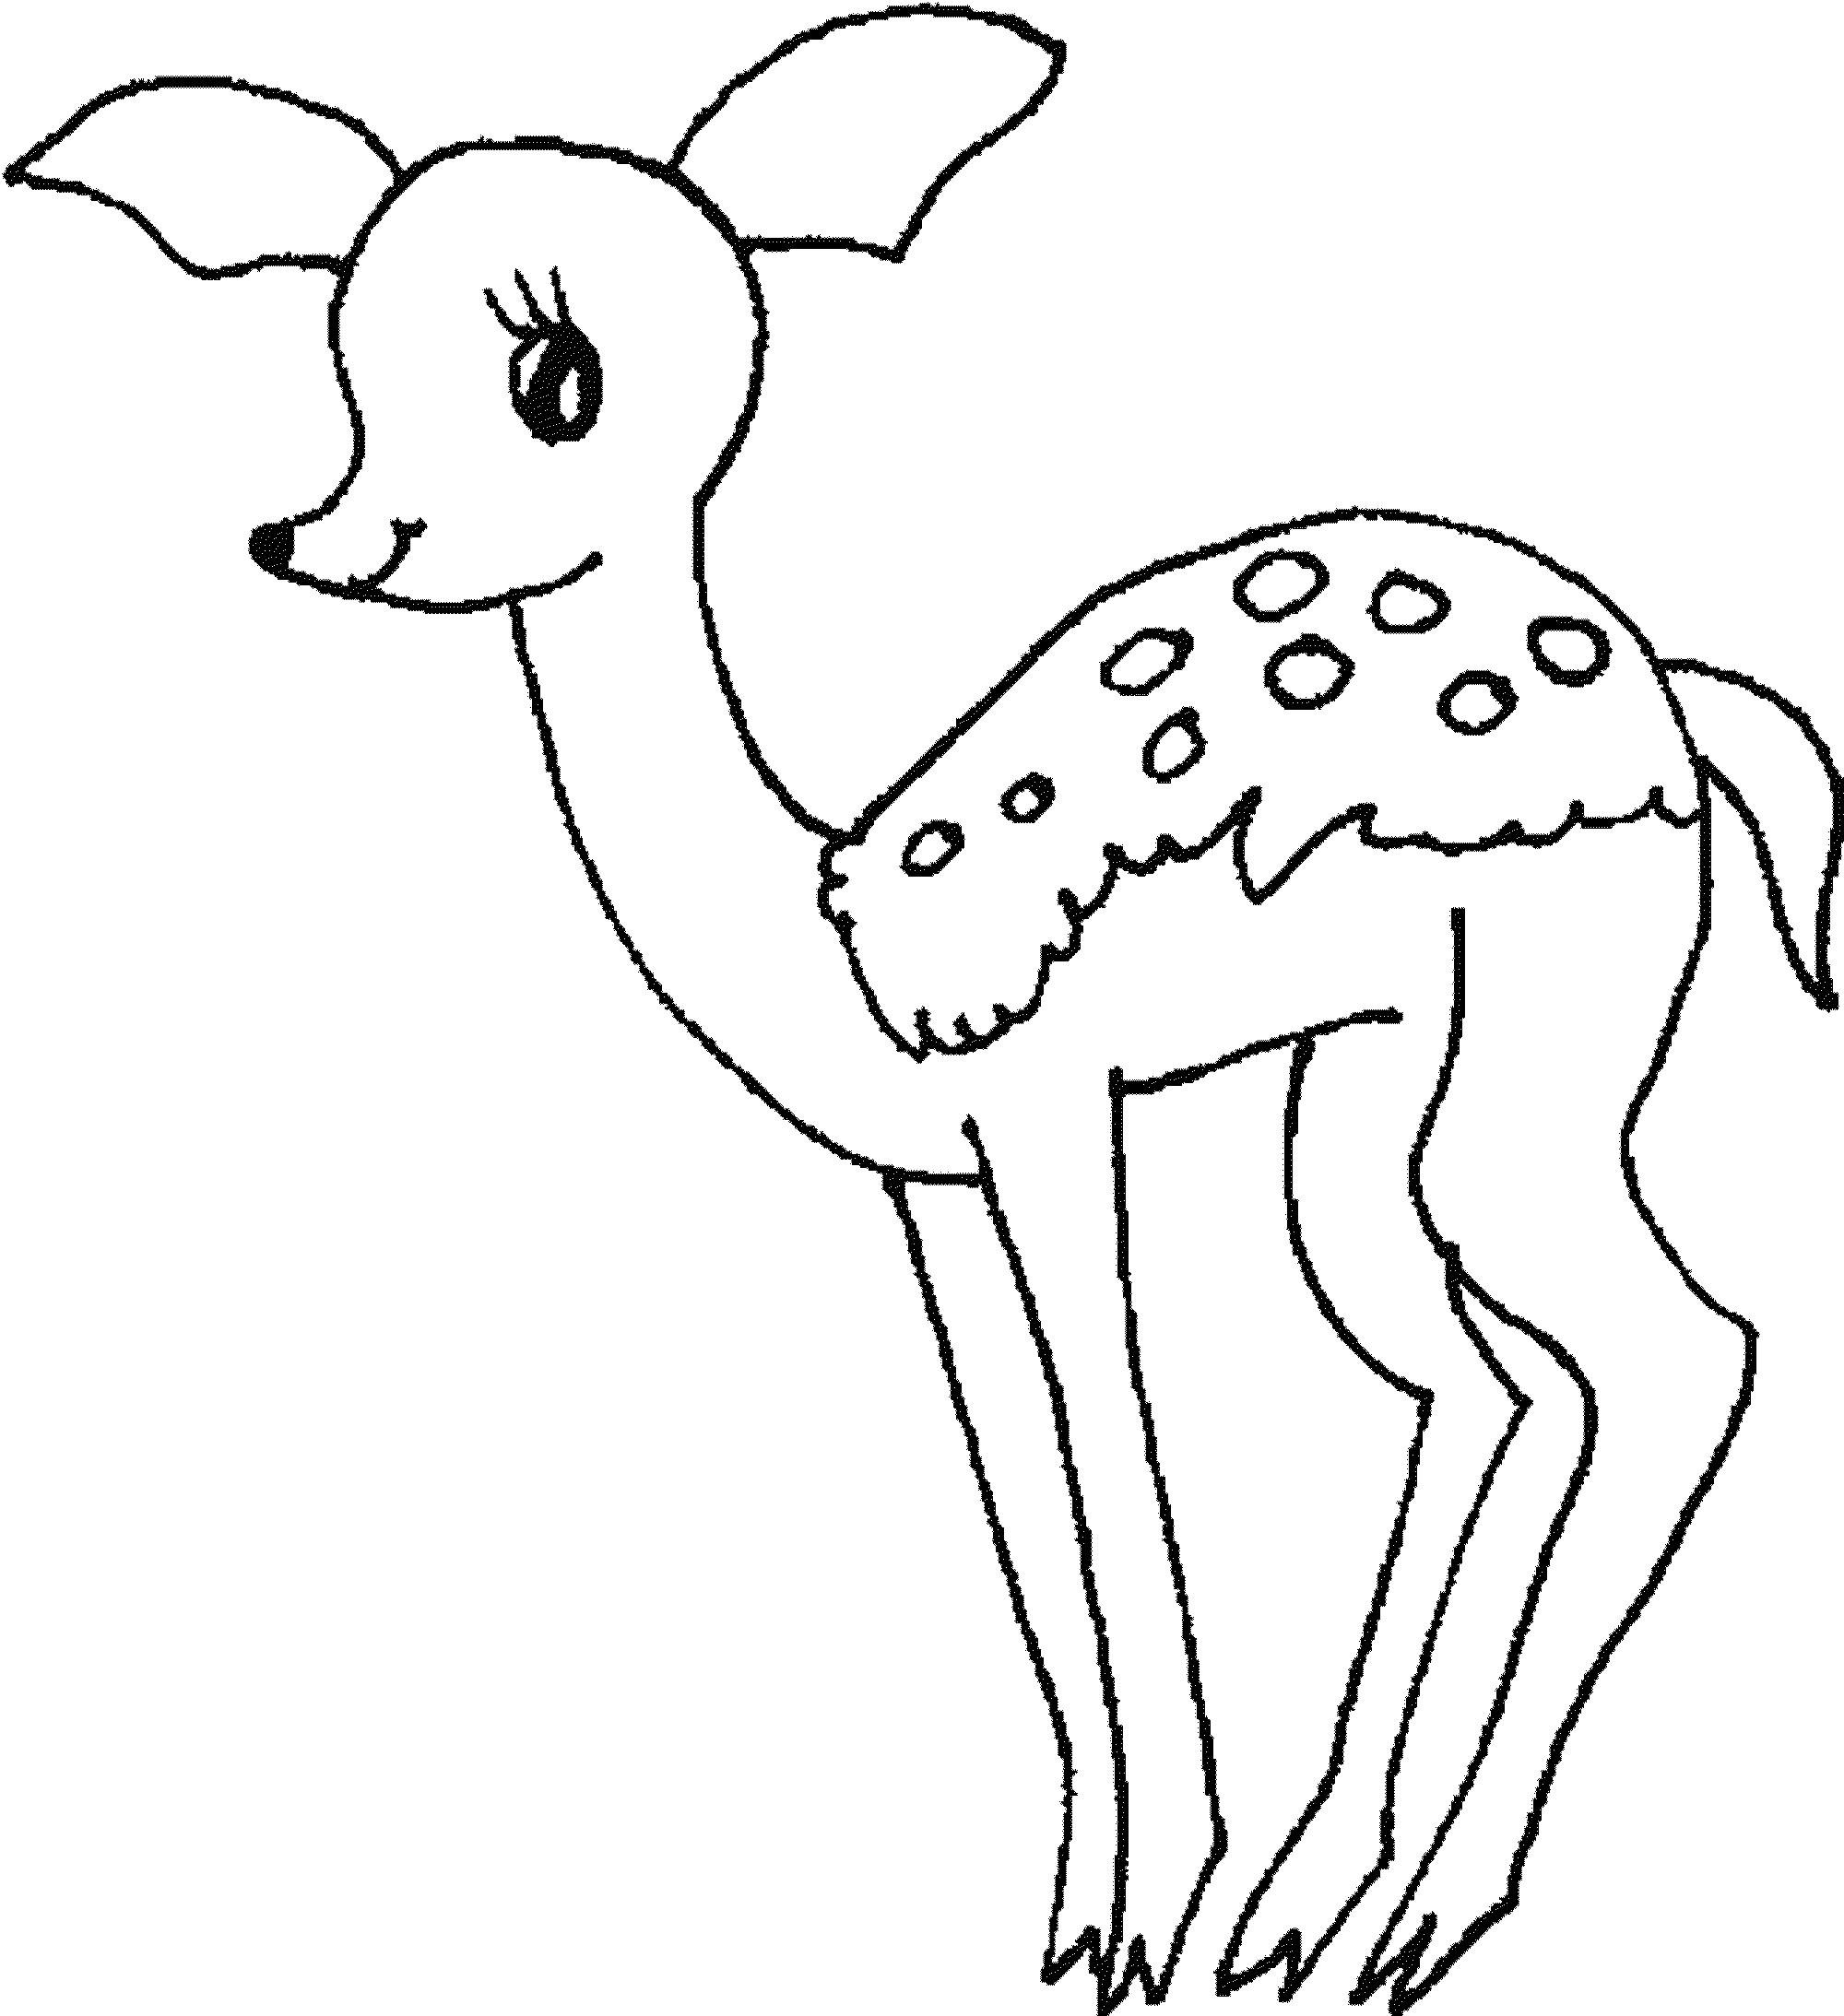 deer coloring sheet print download deer coloring pages for totally deer sheet coloring